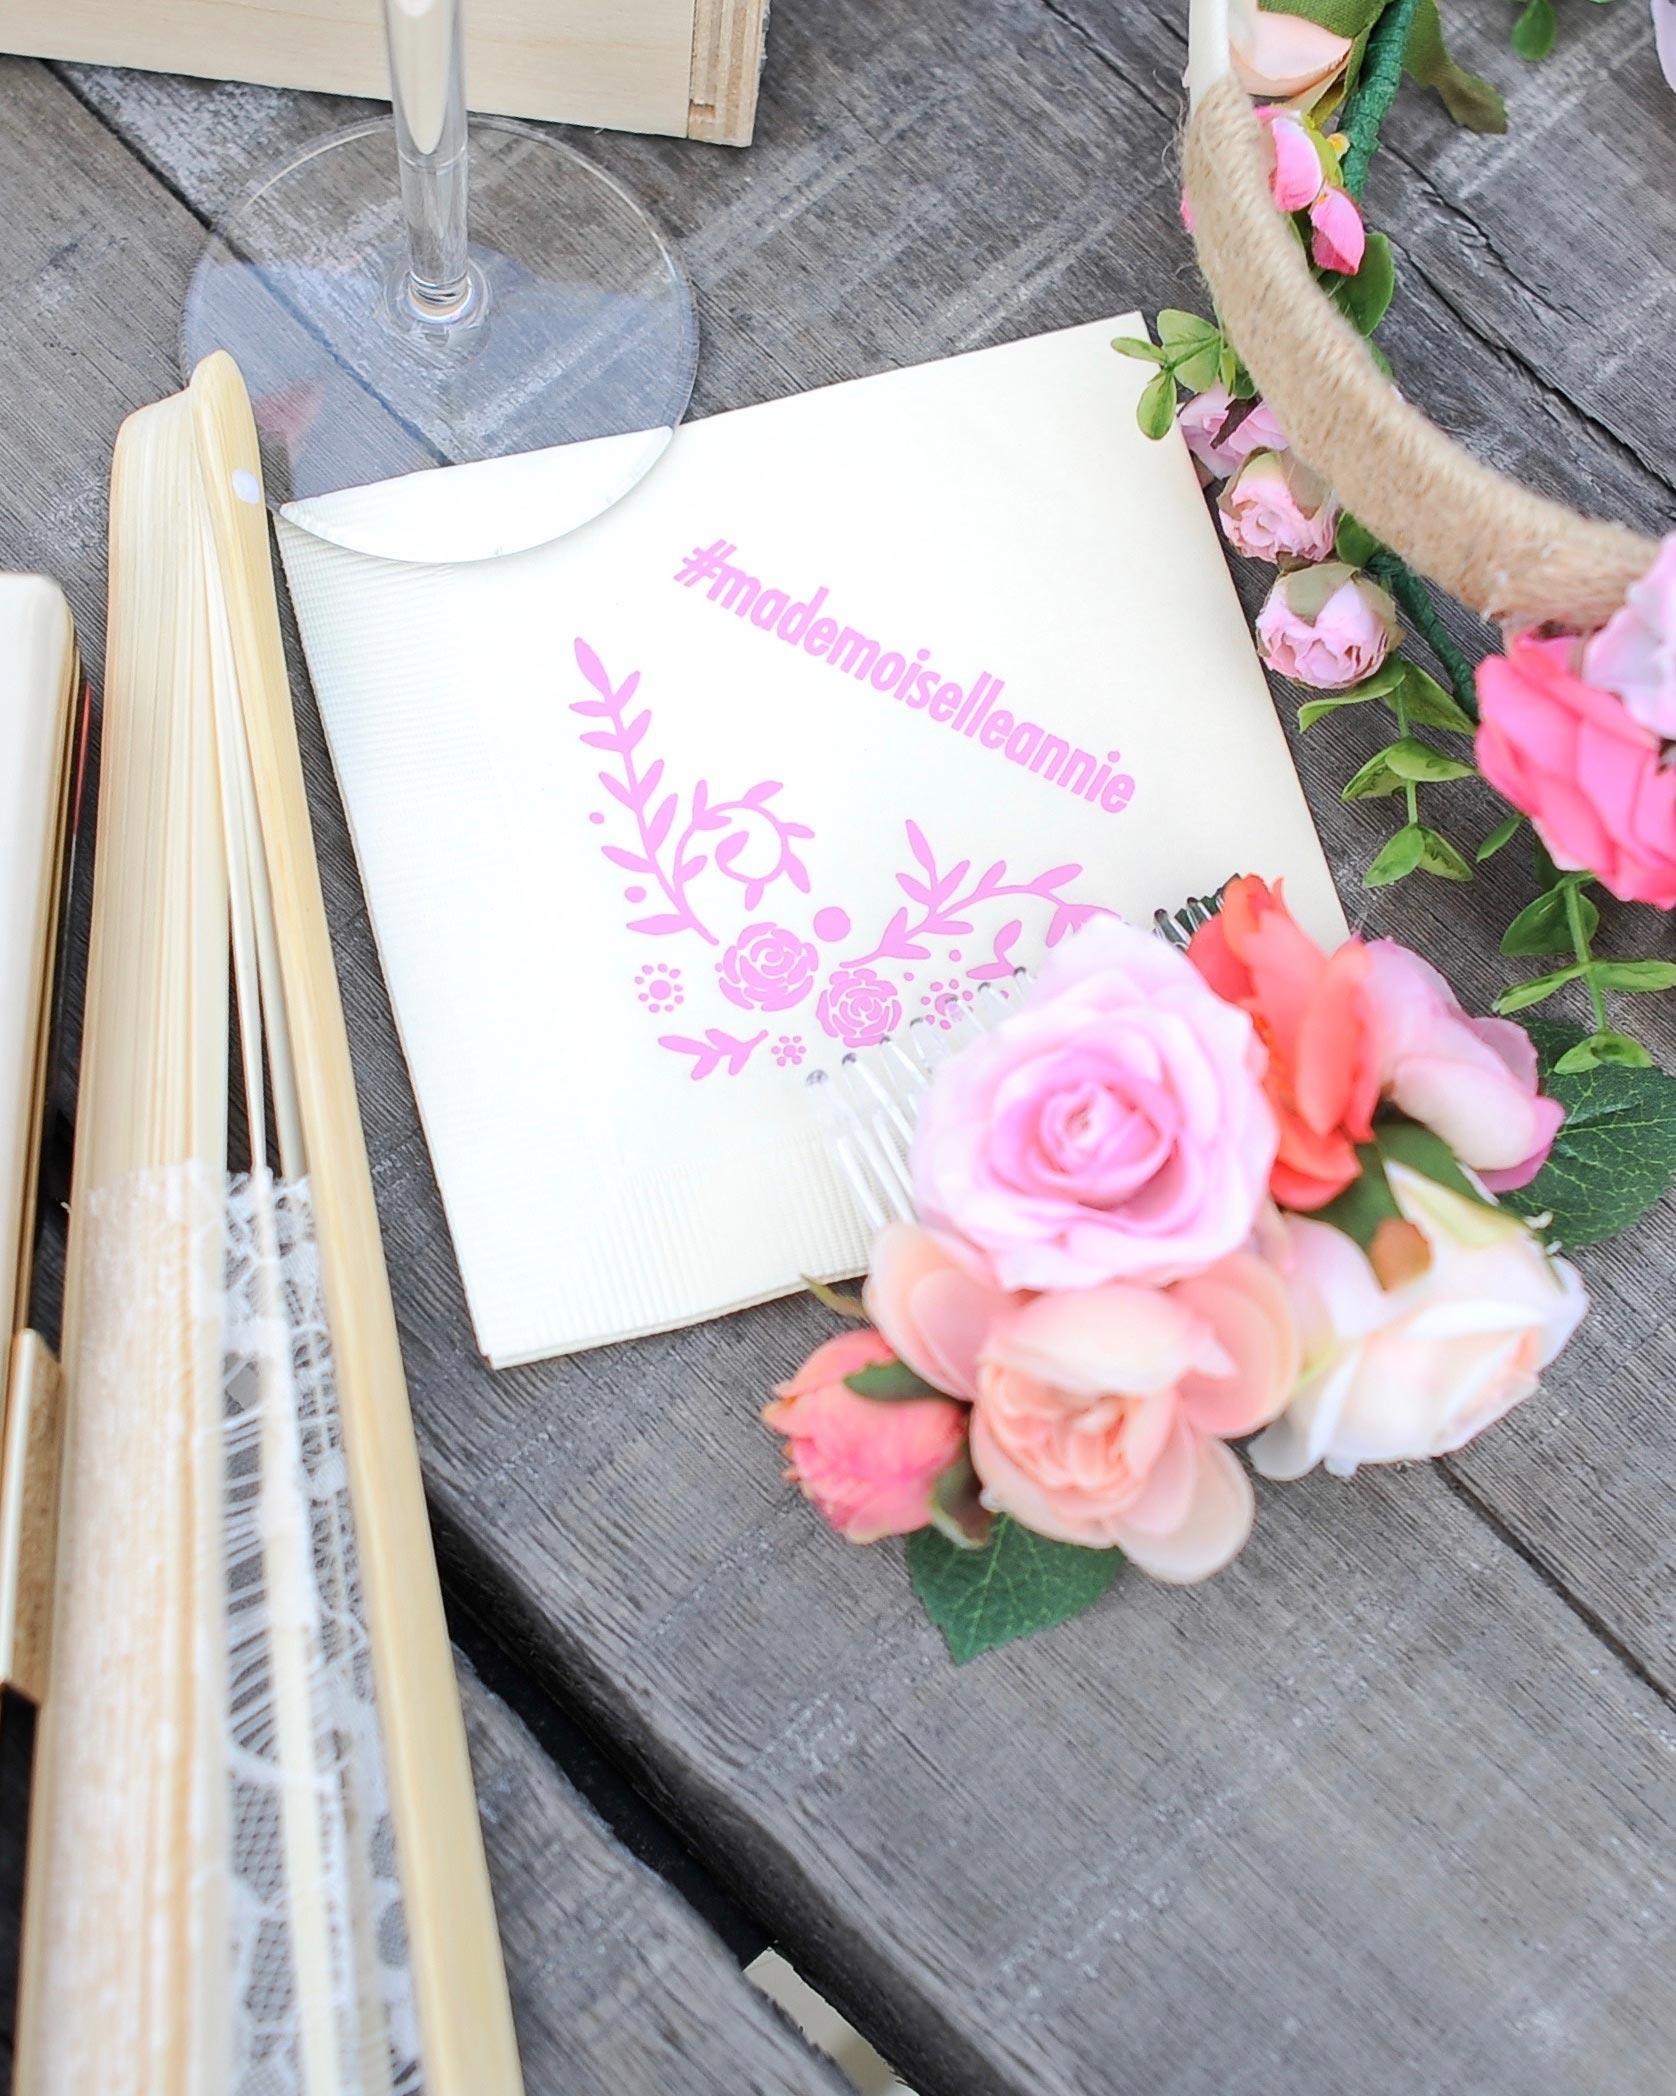 annie-atkinson-bridal-shower-napkin-hashtag-fan-flowers-0616.jpg